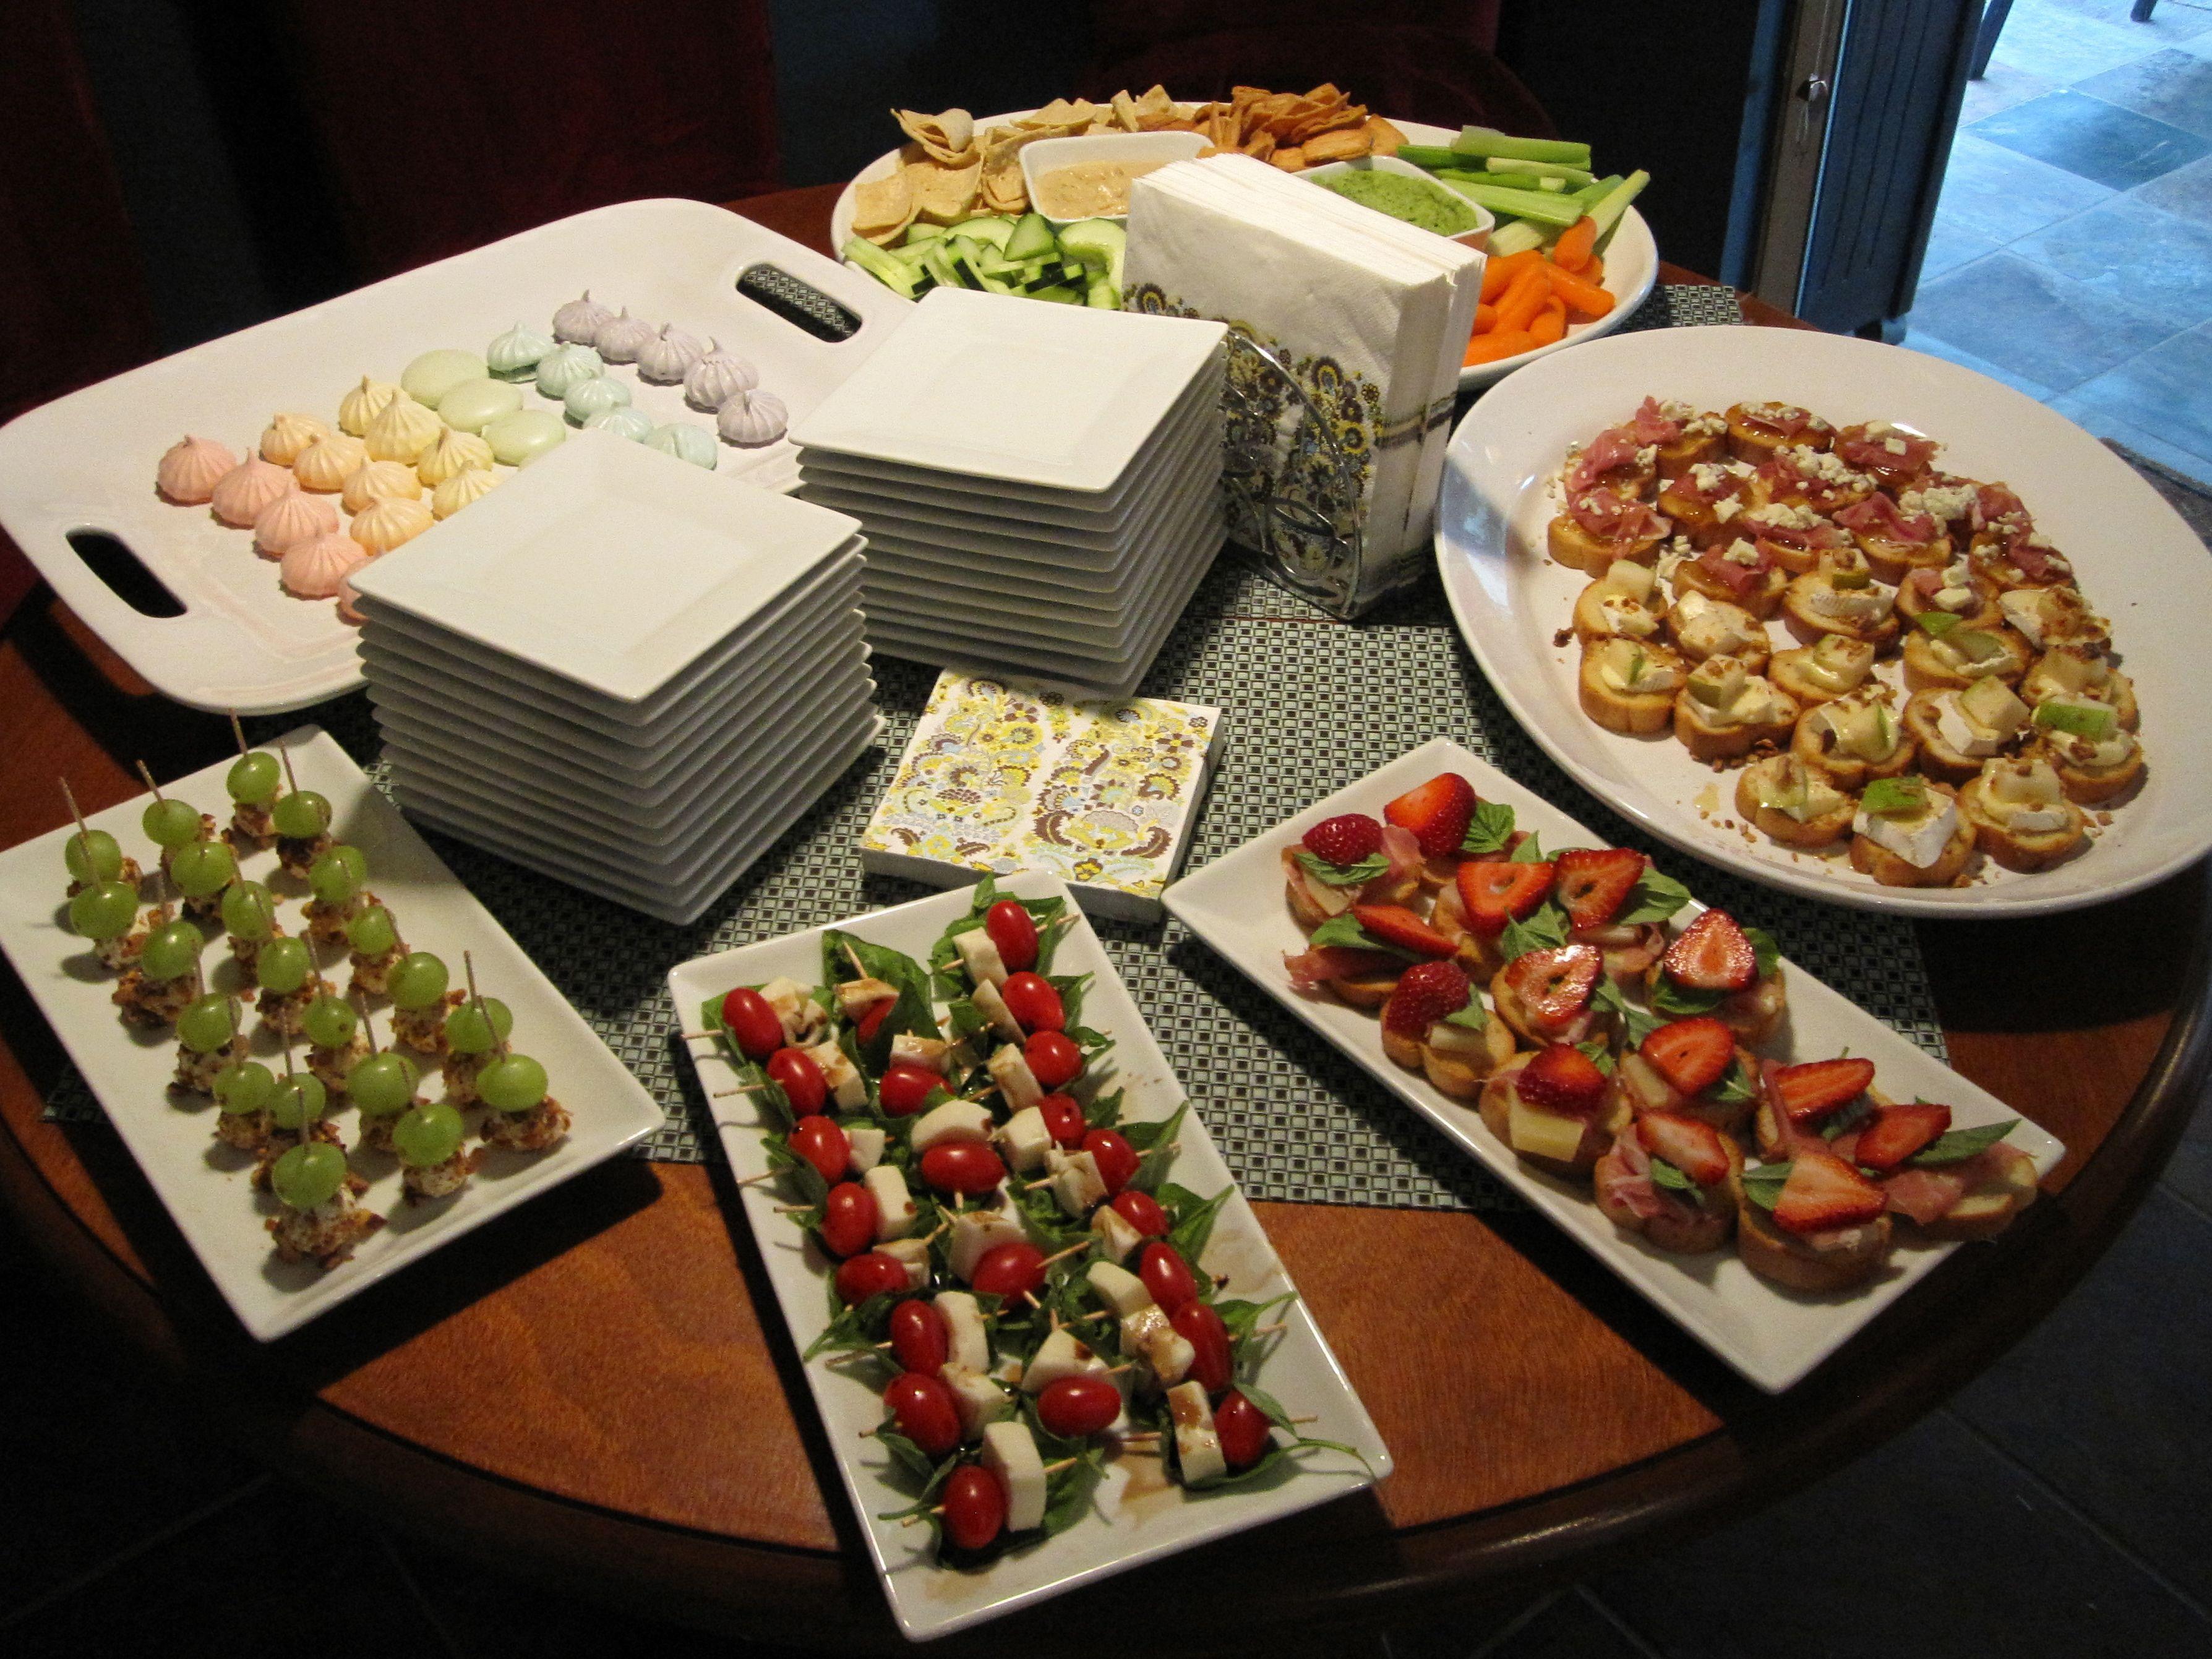 Wine And Cheese Invitation Wording as beautiful invitation ideas